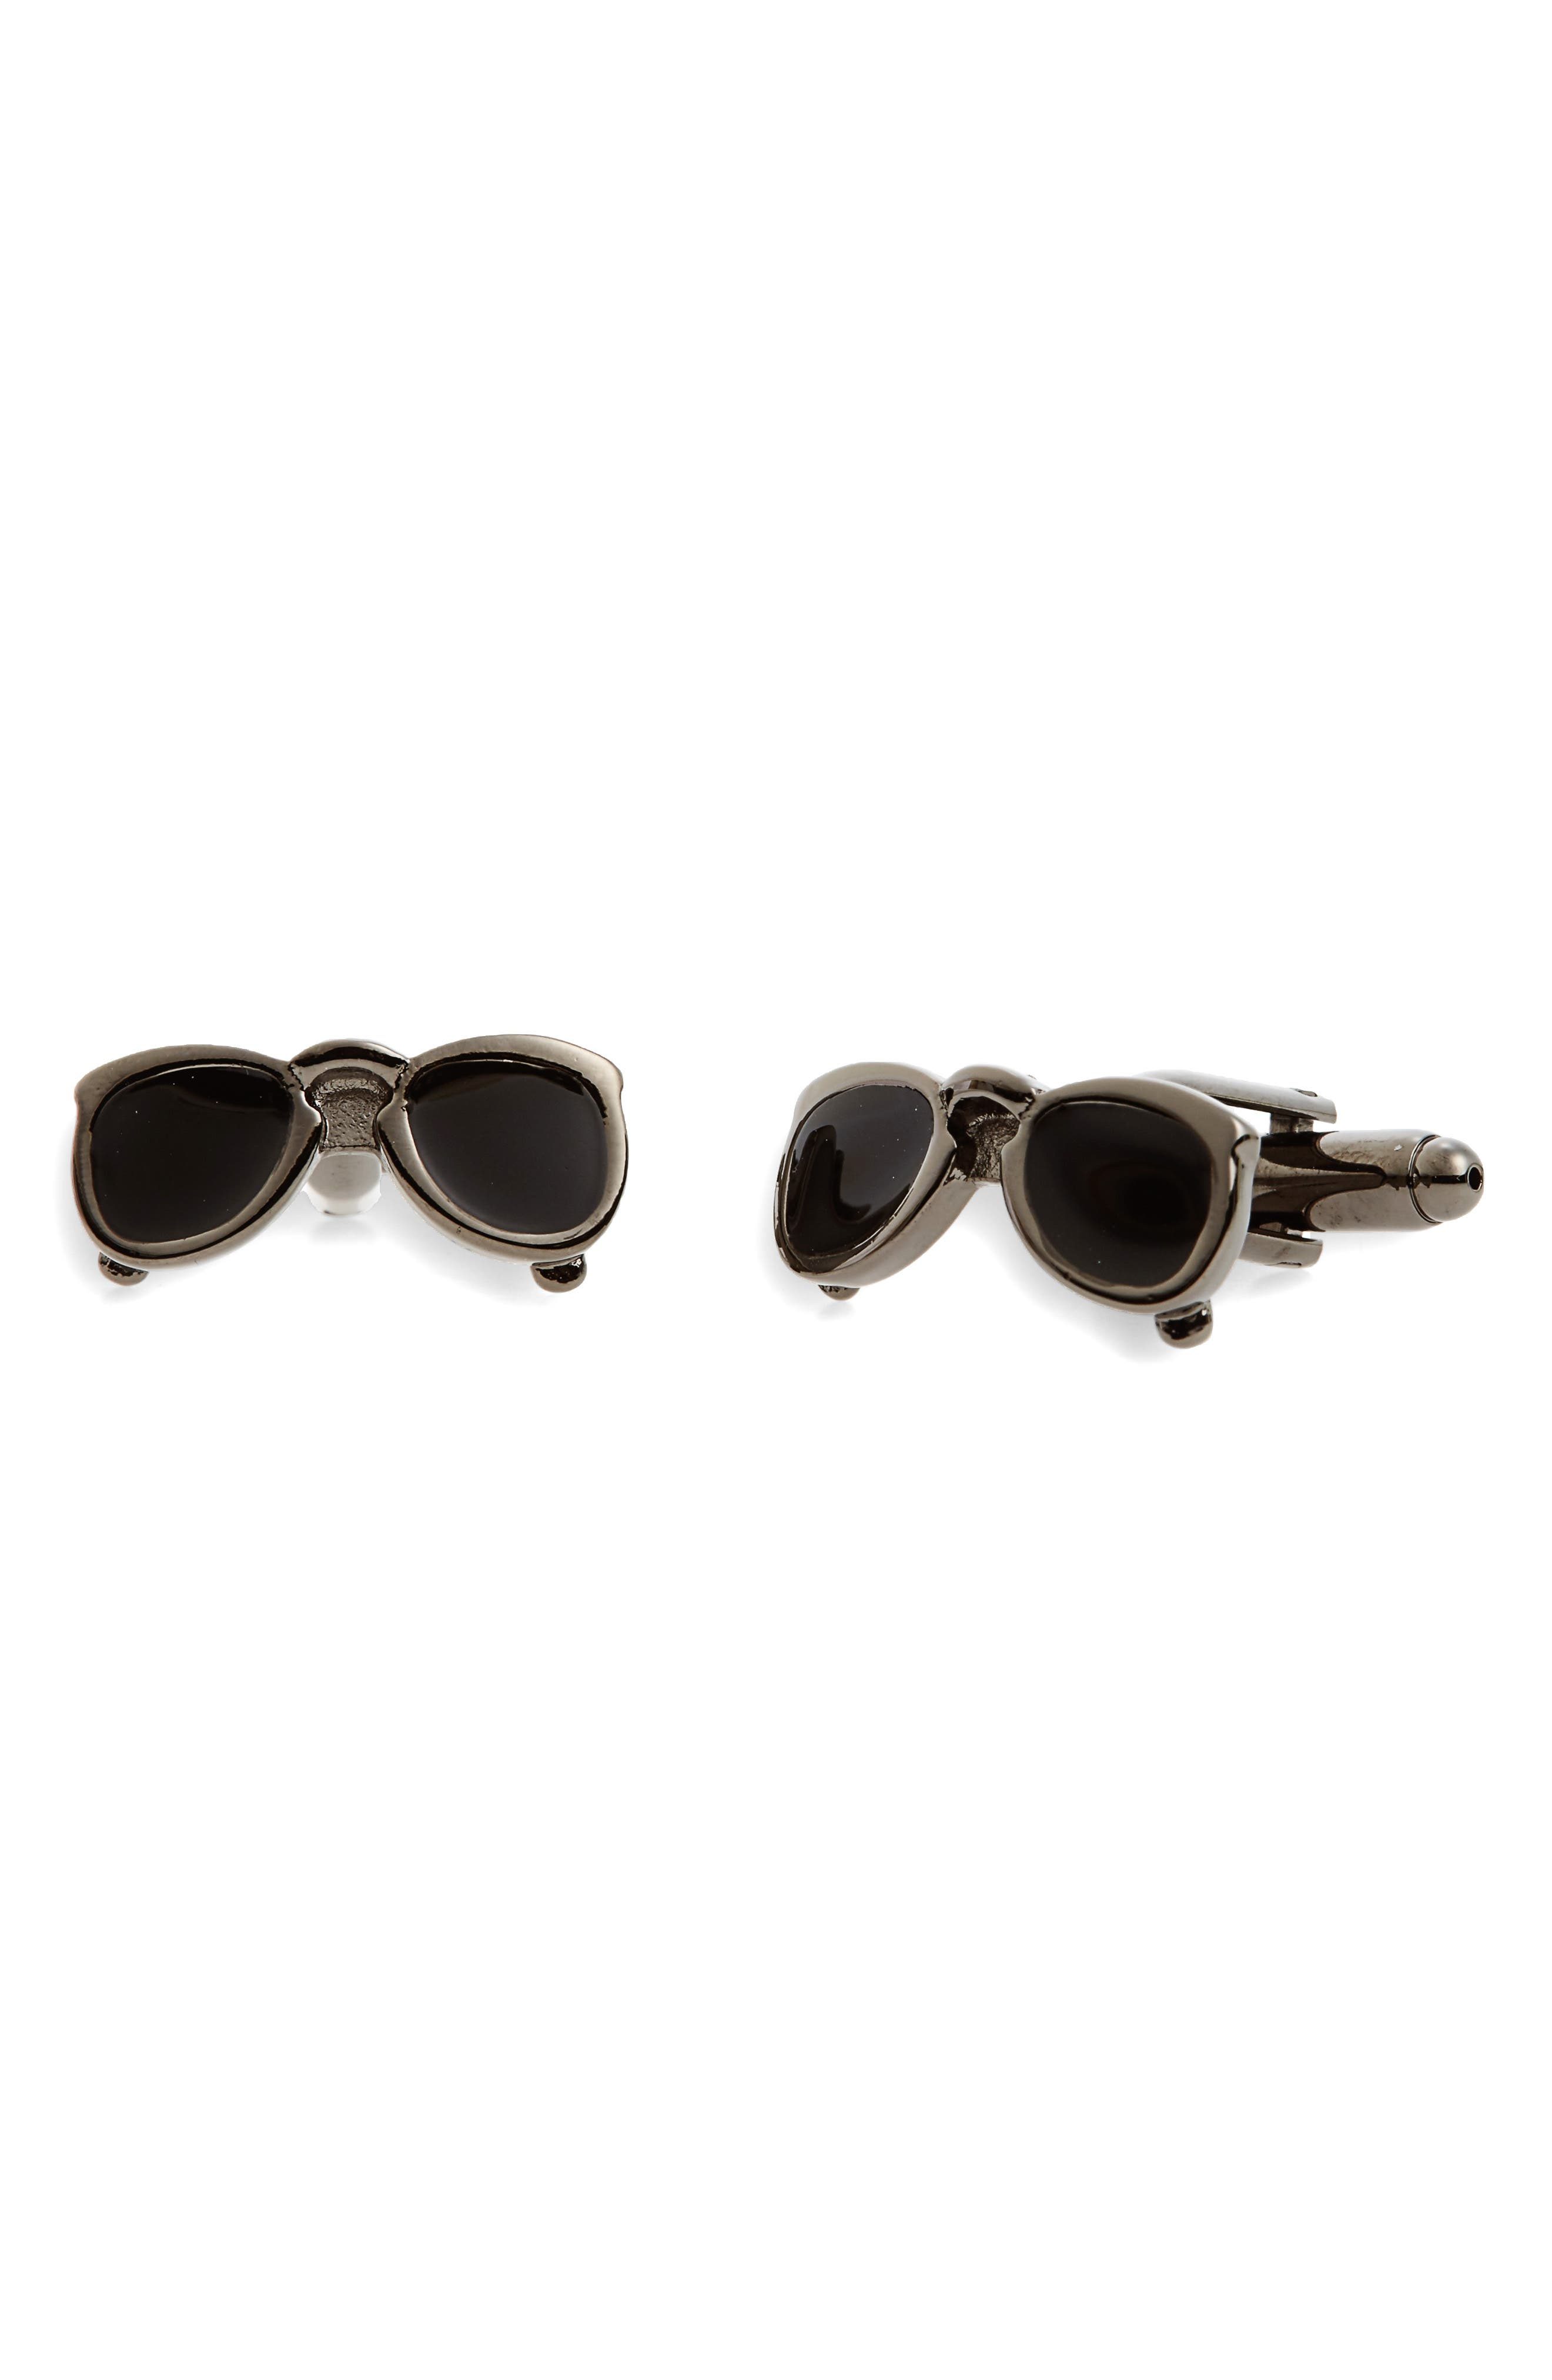 Sunglasses Cuff Links,                         Main,                         color, Black